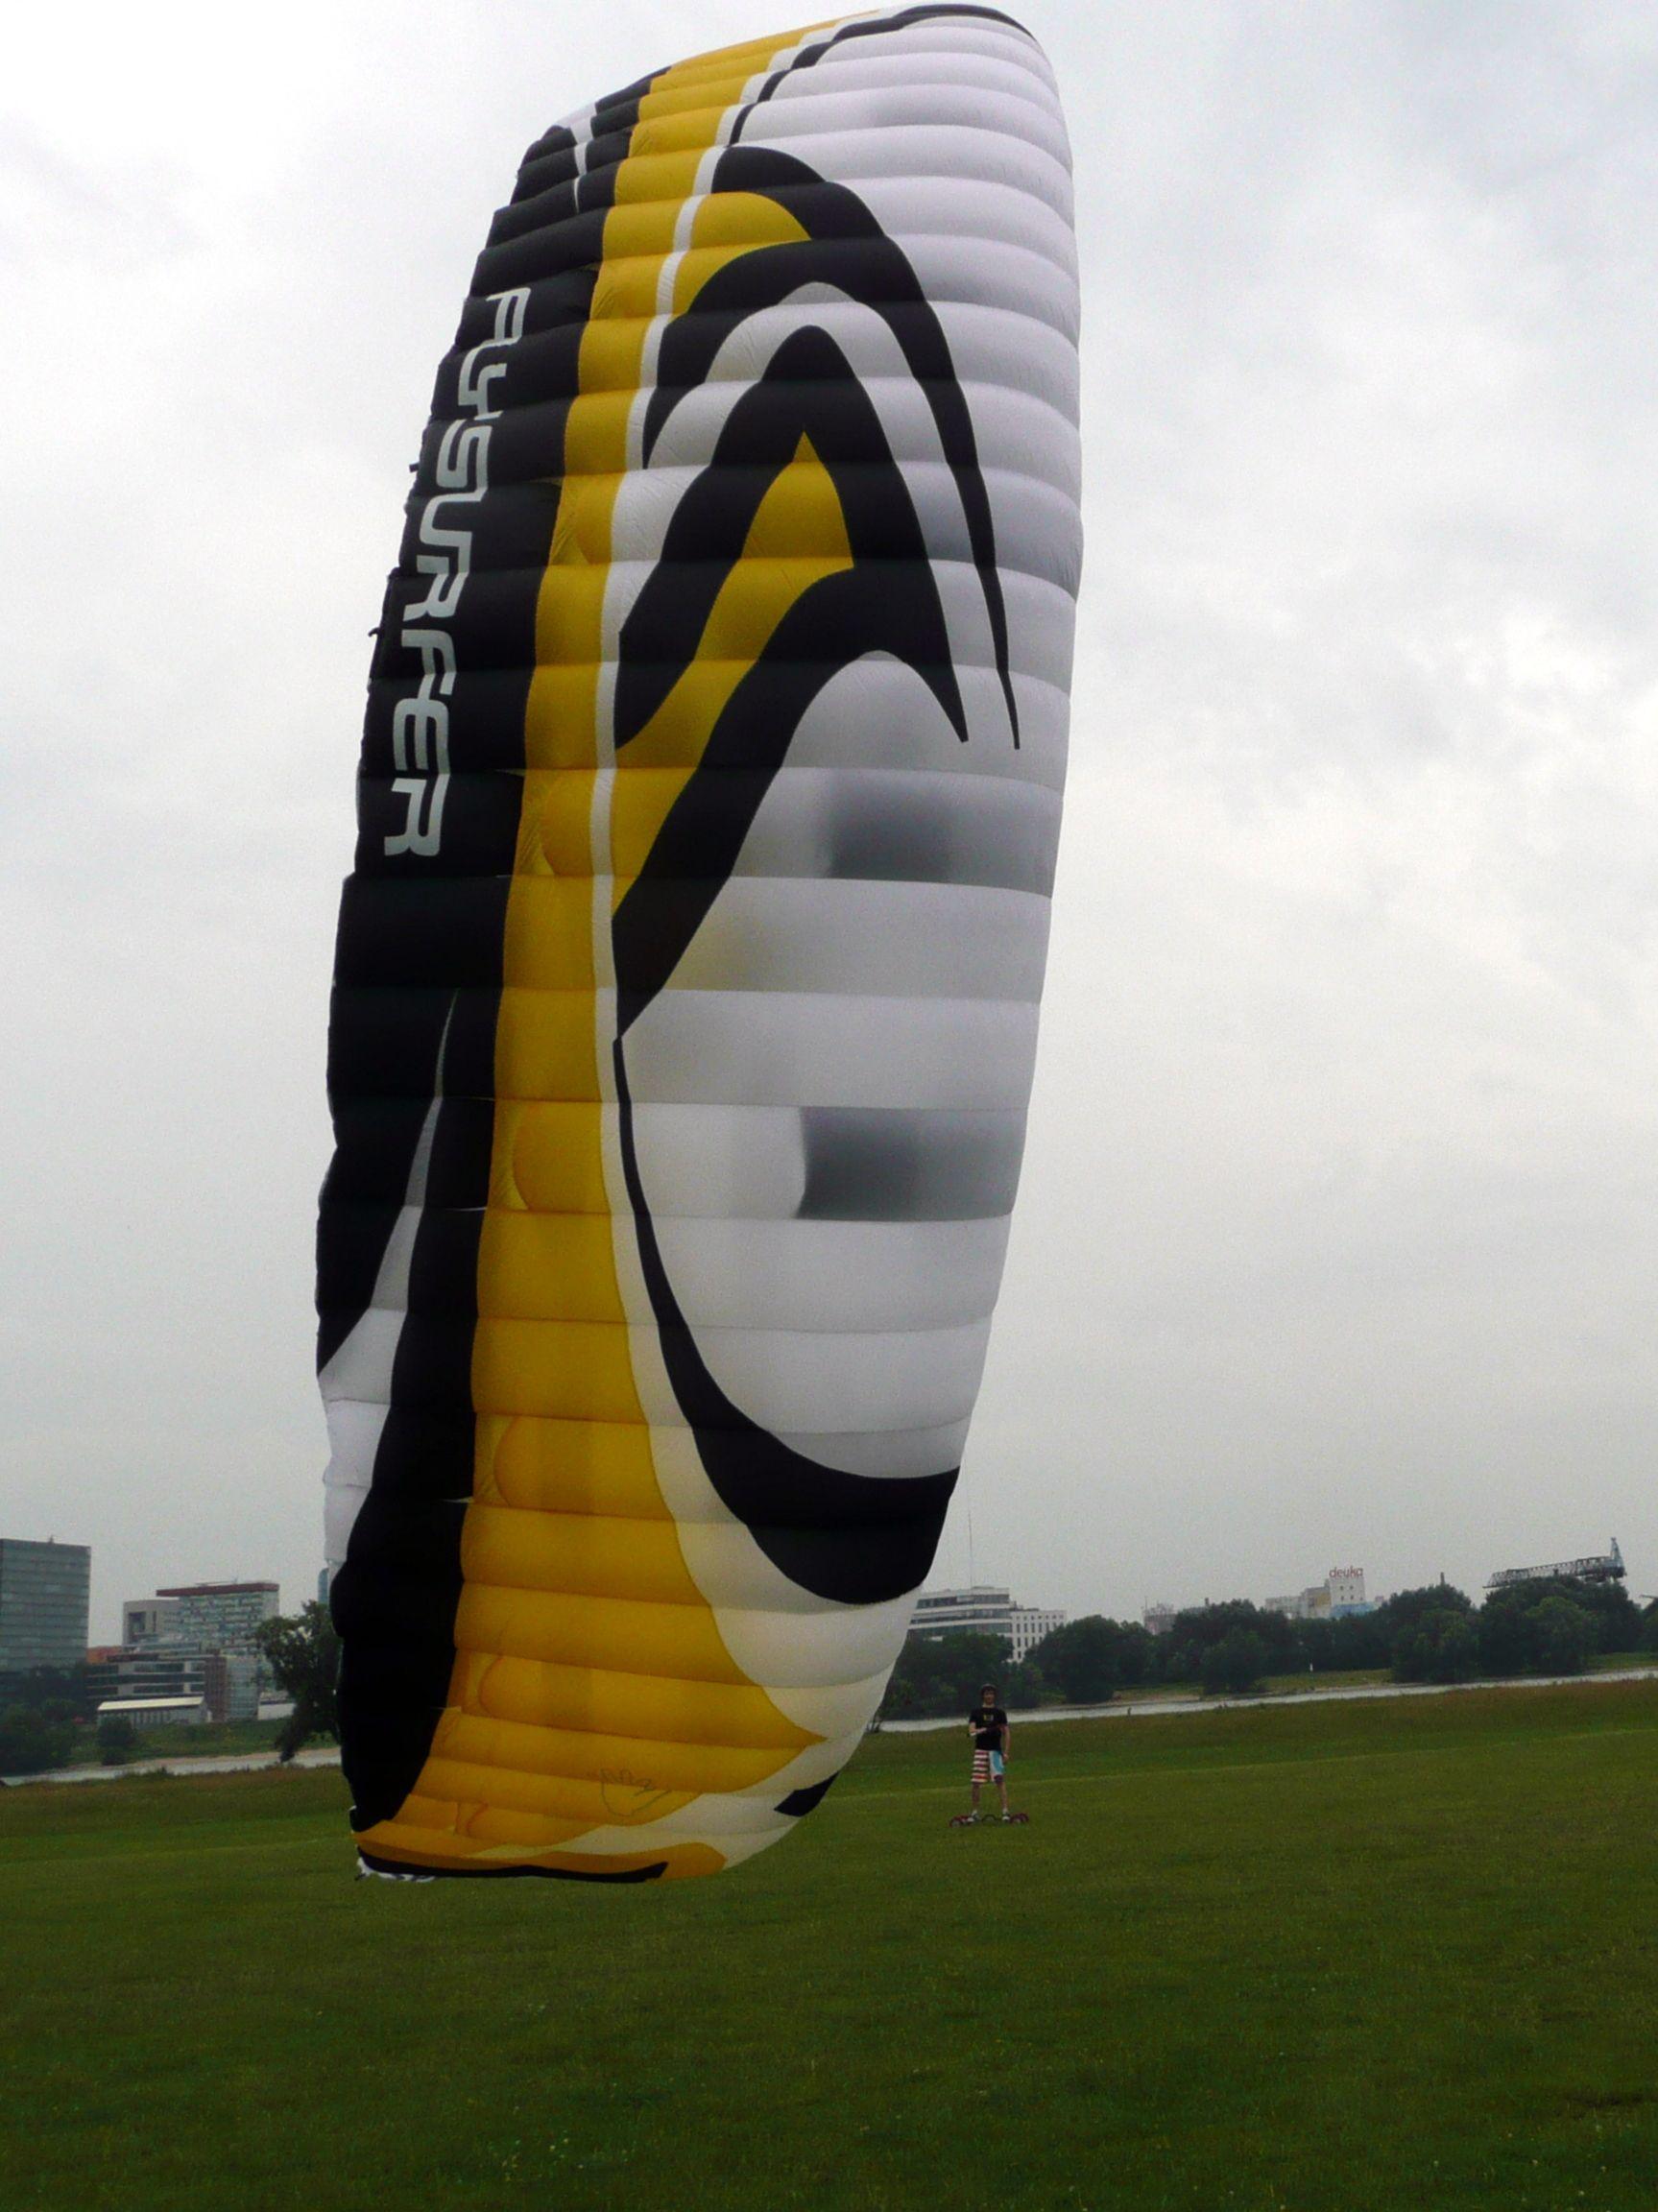 Kitelandboarding In Düsseldorf Germany With The New Flysurfer Speed 3 Ce